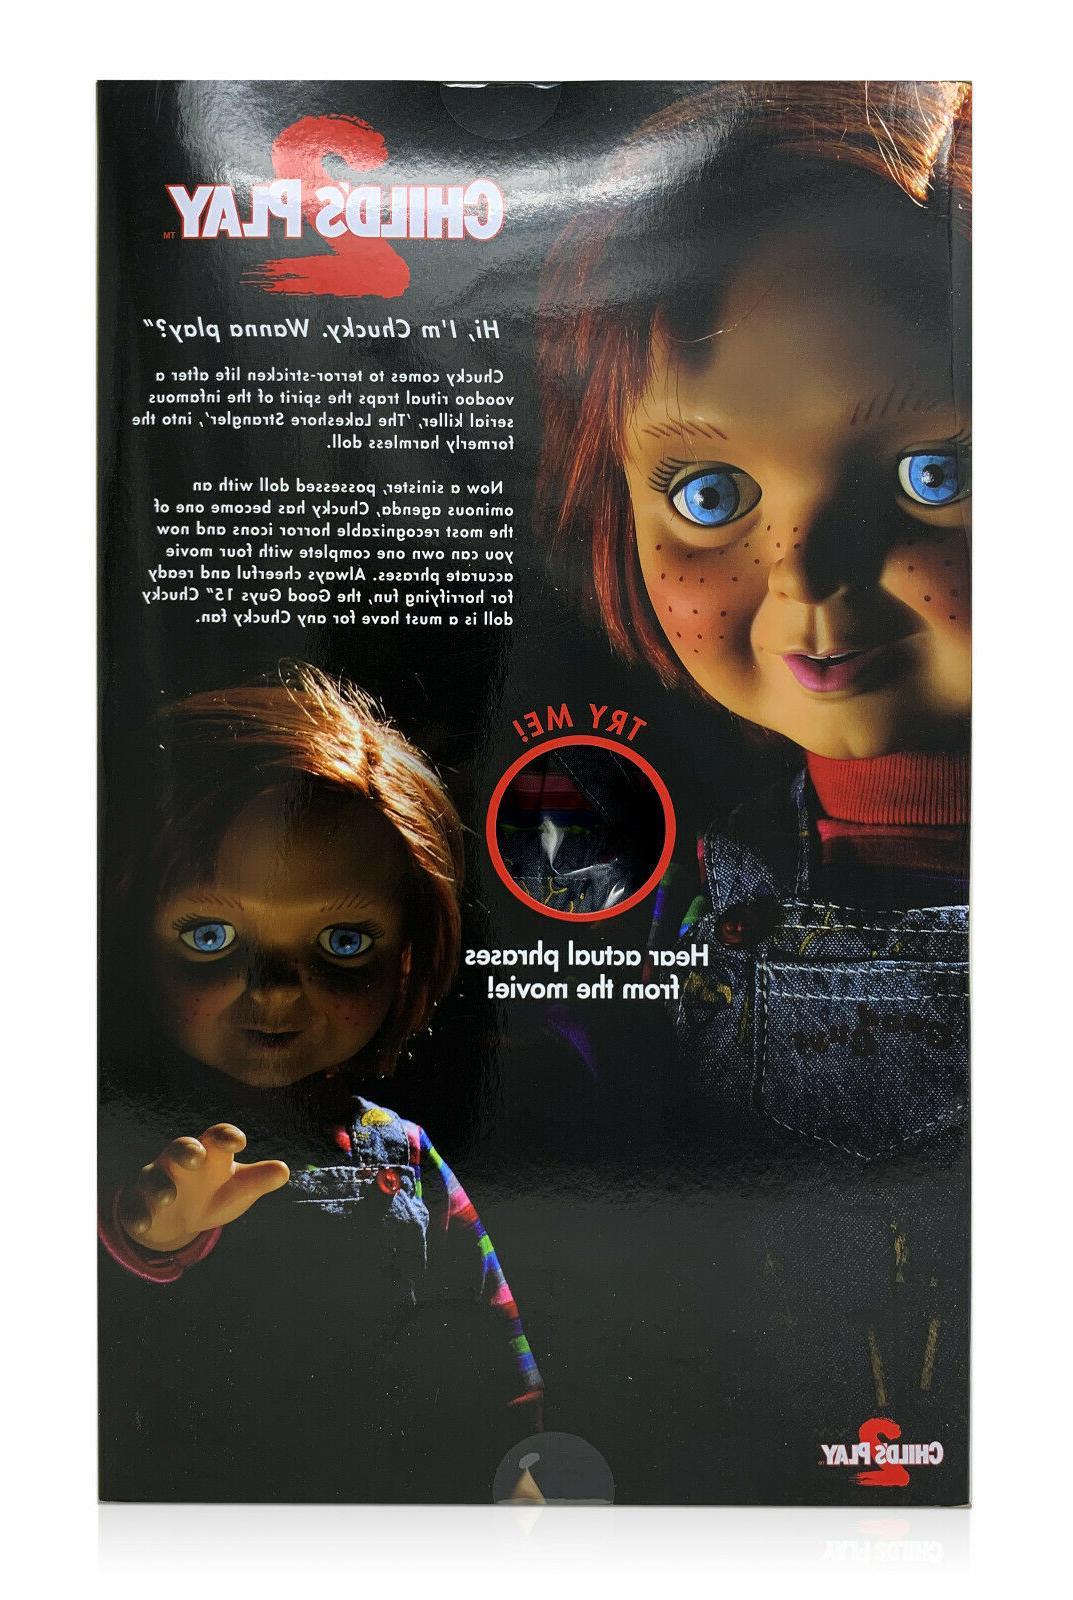 "Mezco Toyz Child's Mega 15"" Talking Good Figure"